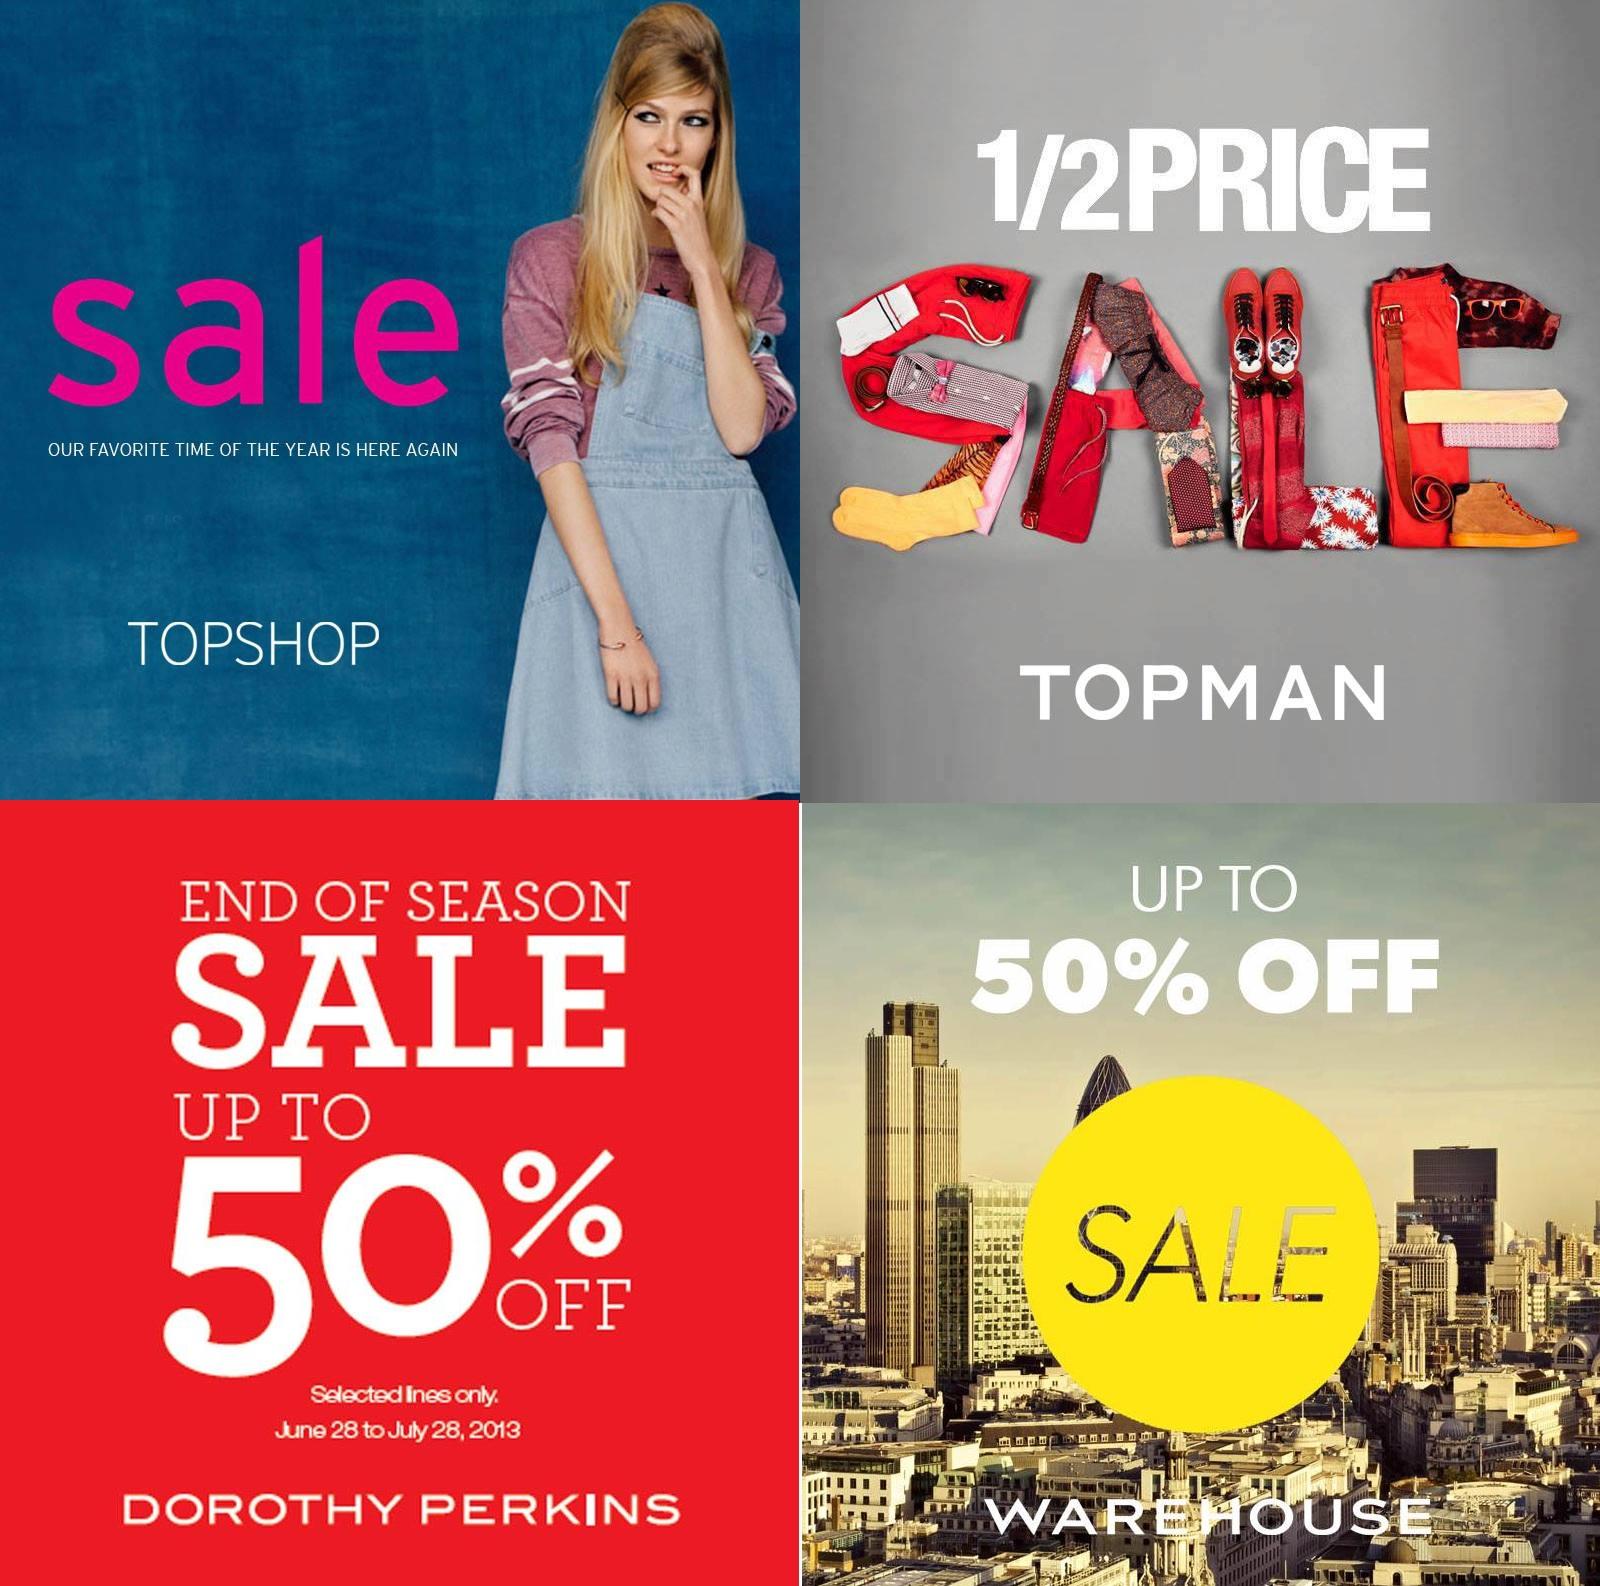 cc801931730ad Topshop Topman Dorothy Perkins Warehouse End of Season Sale June - July 2013